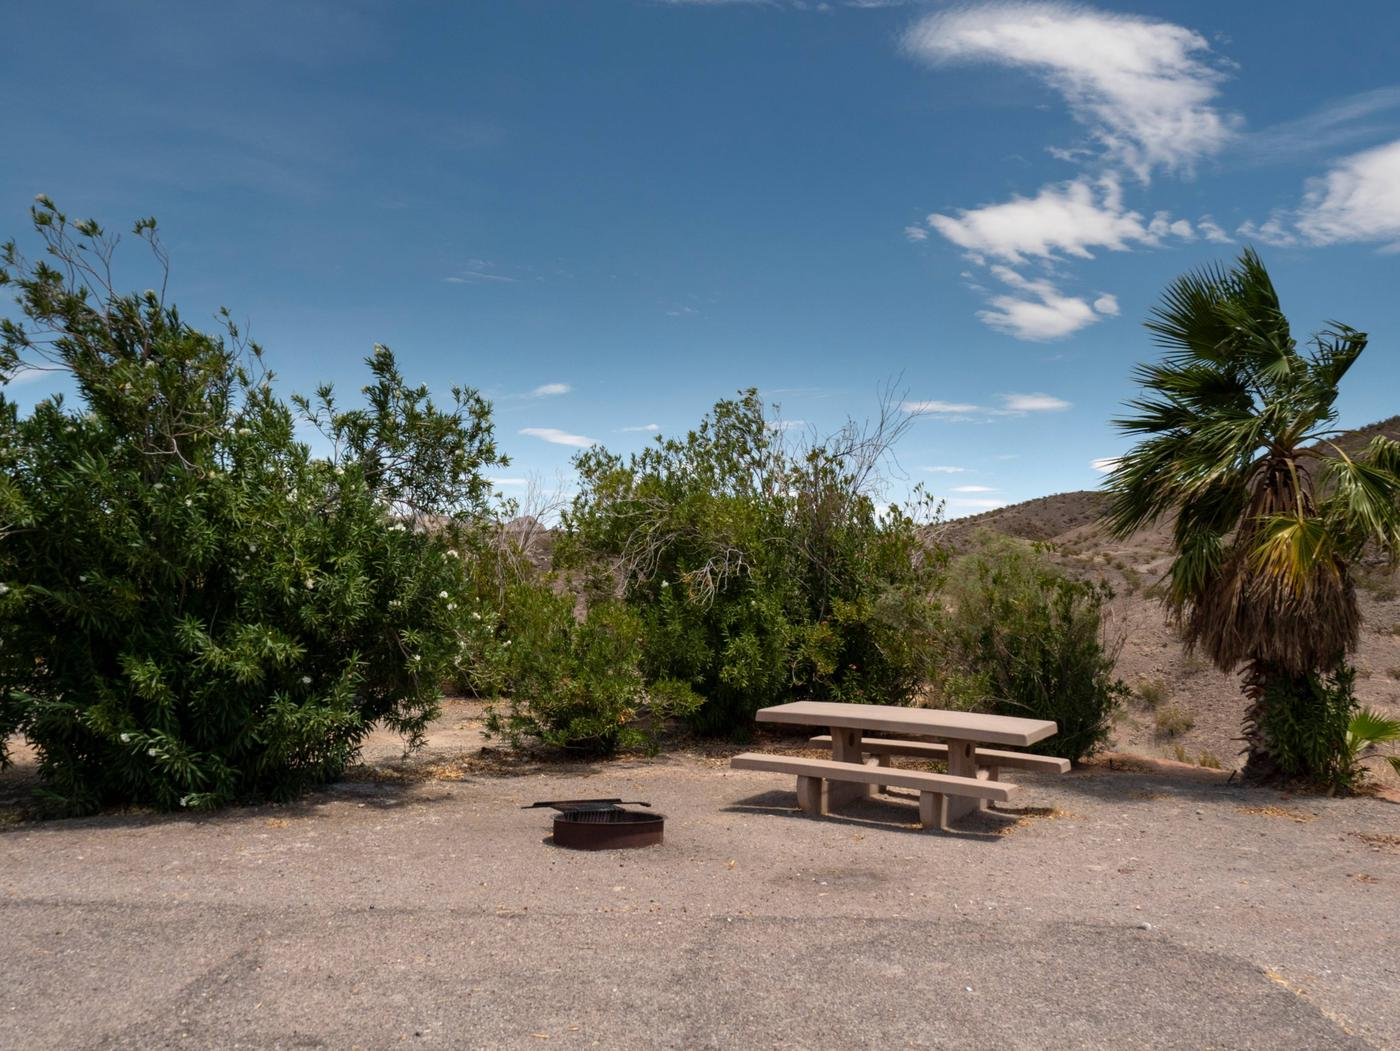 Campsite located in a desert settingCallville Bay Campground